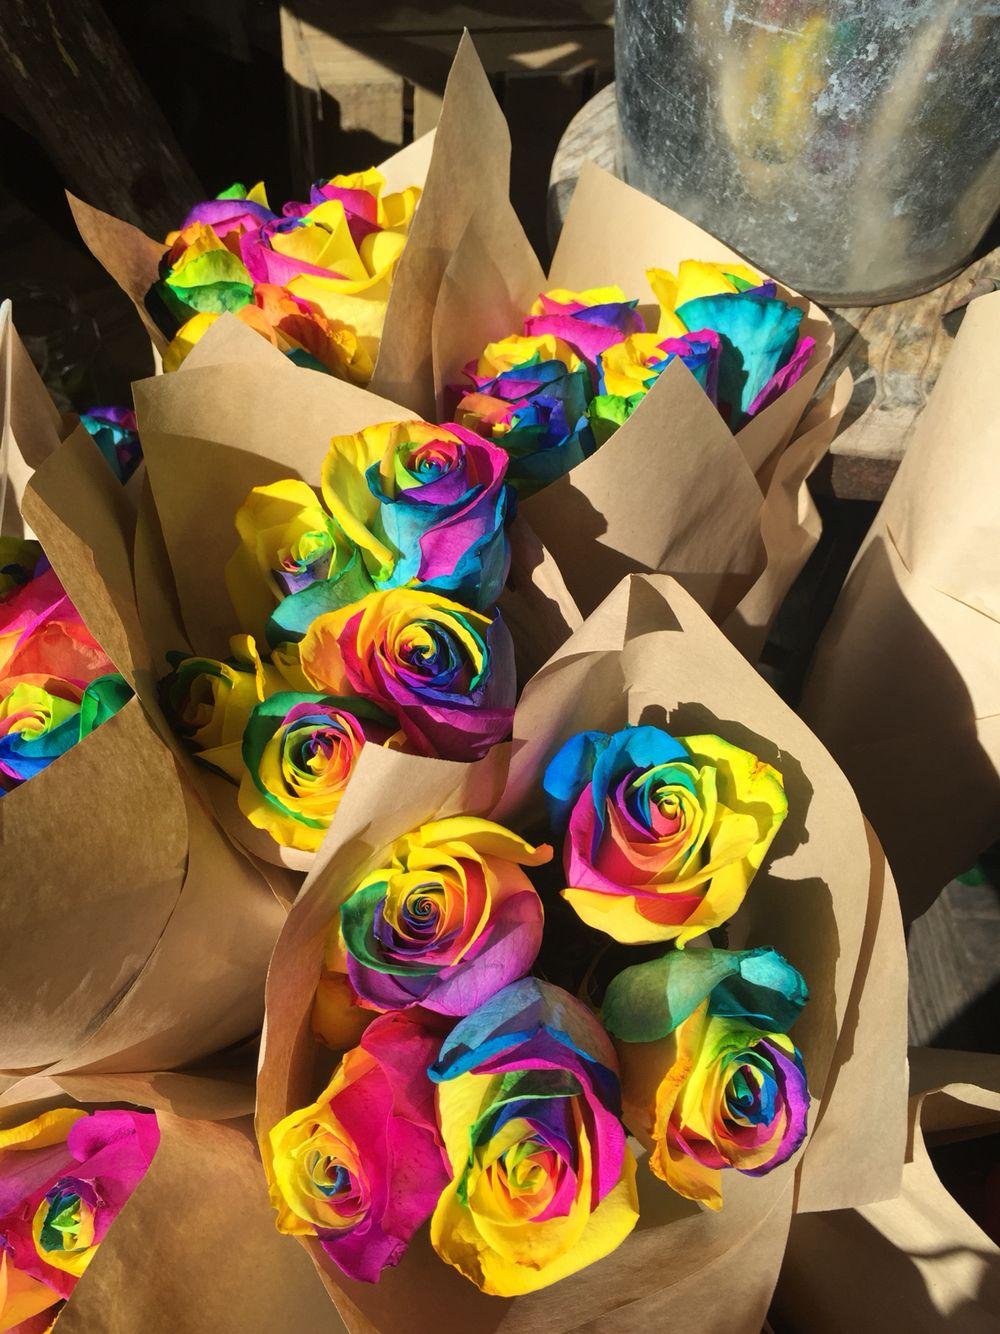 Beautiful Roses Rainbow Roses Flowers Pretty Beautiful Bouquet